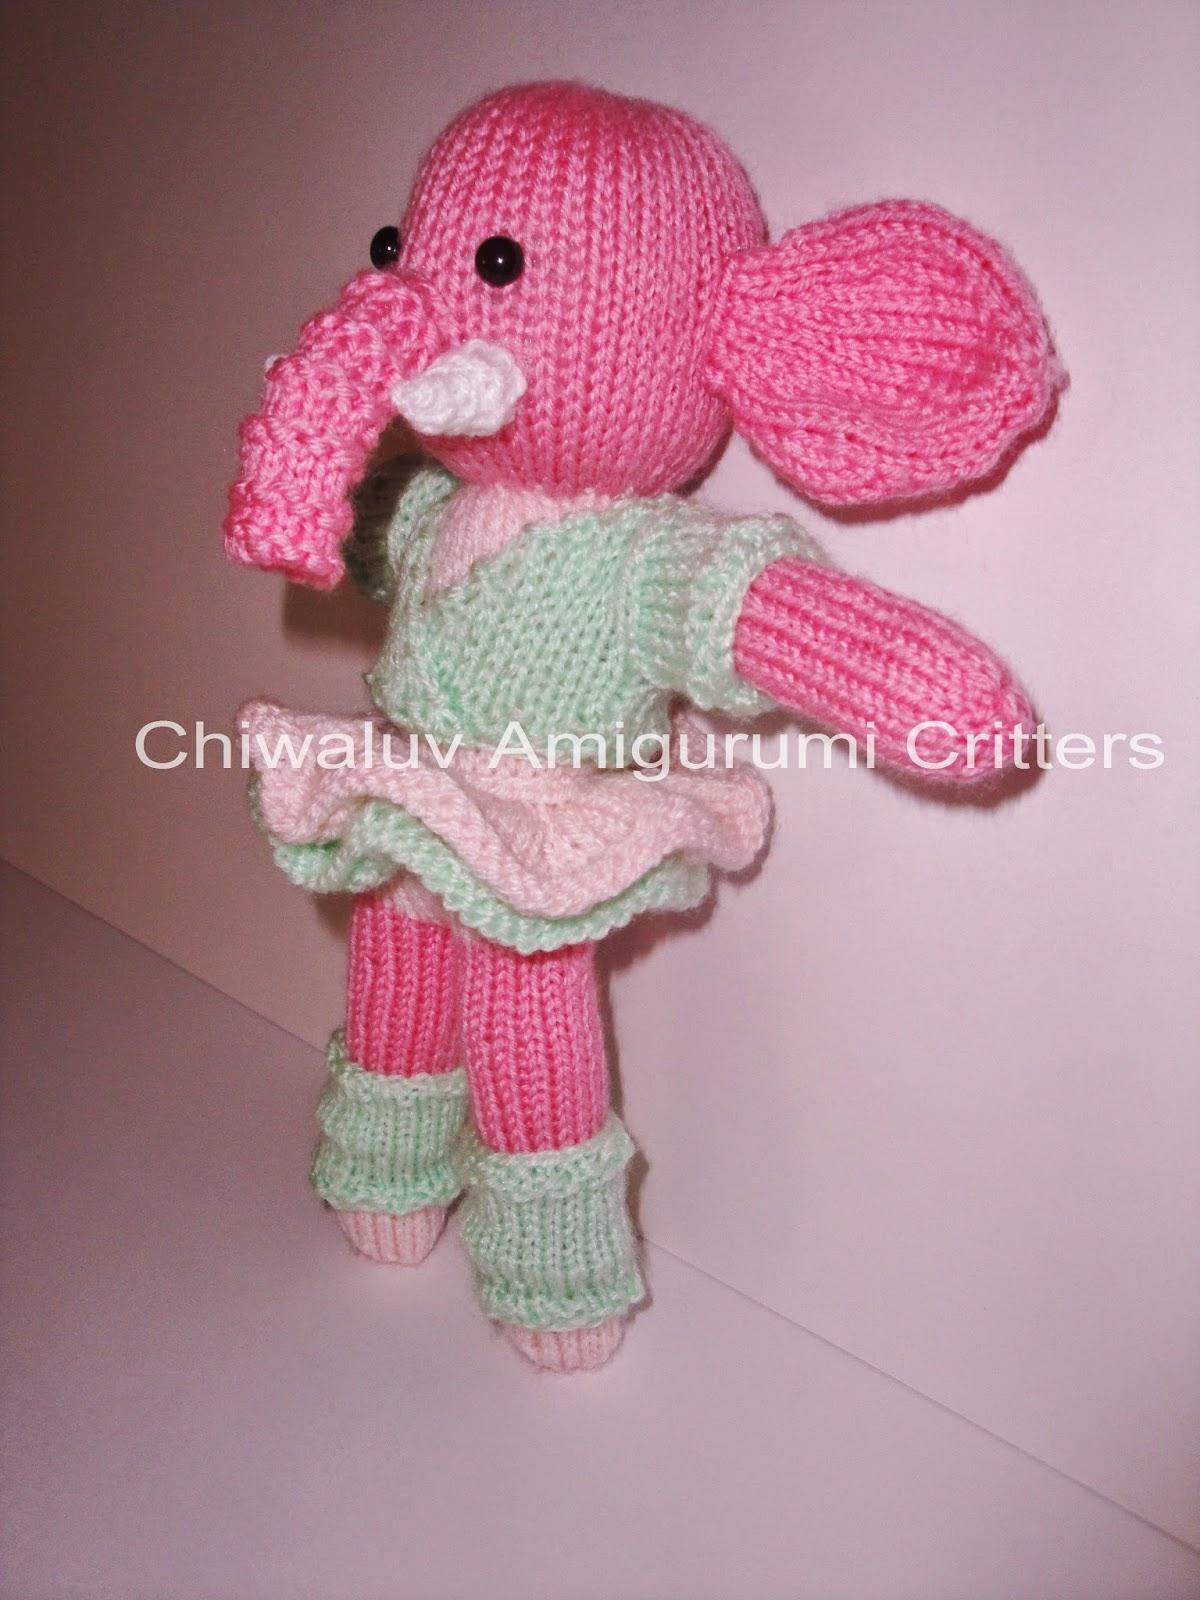 Crochet Elephant handmade amigurumi plushie cute elephant | Etsy | 1600x1200